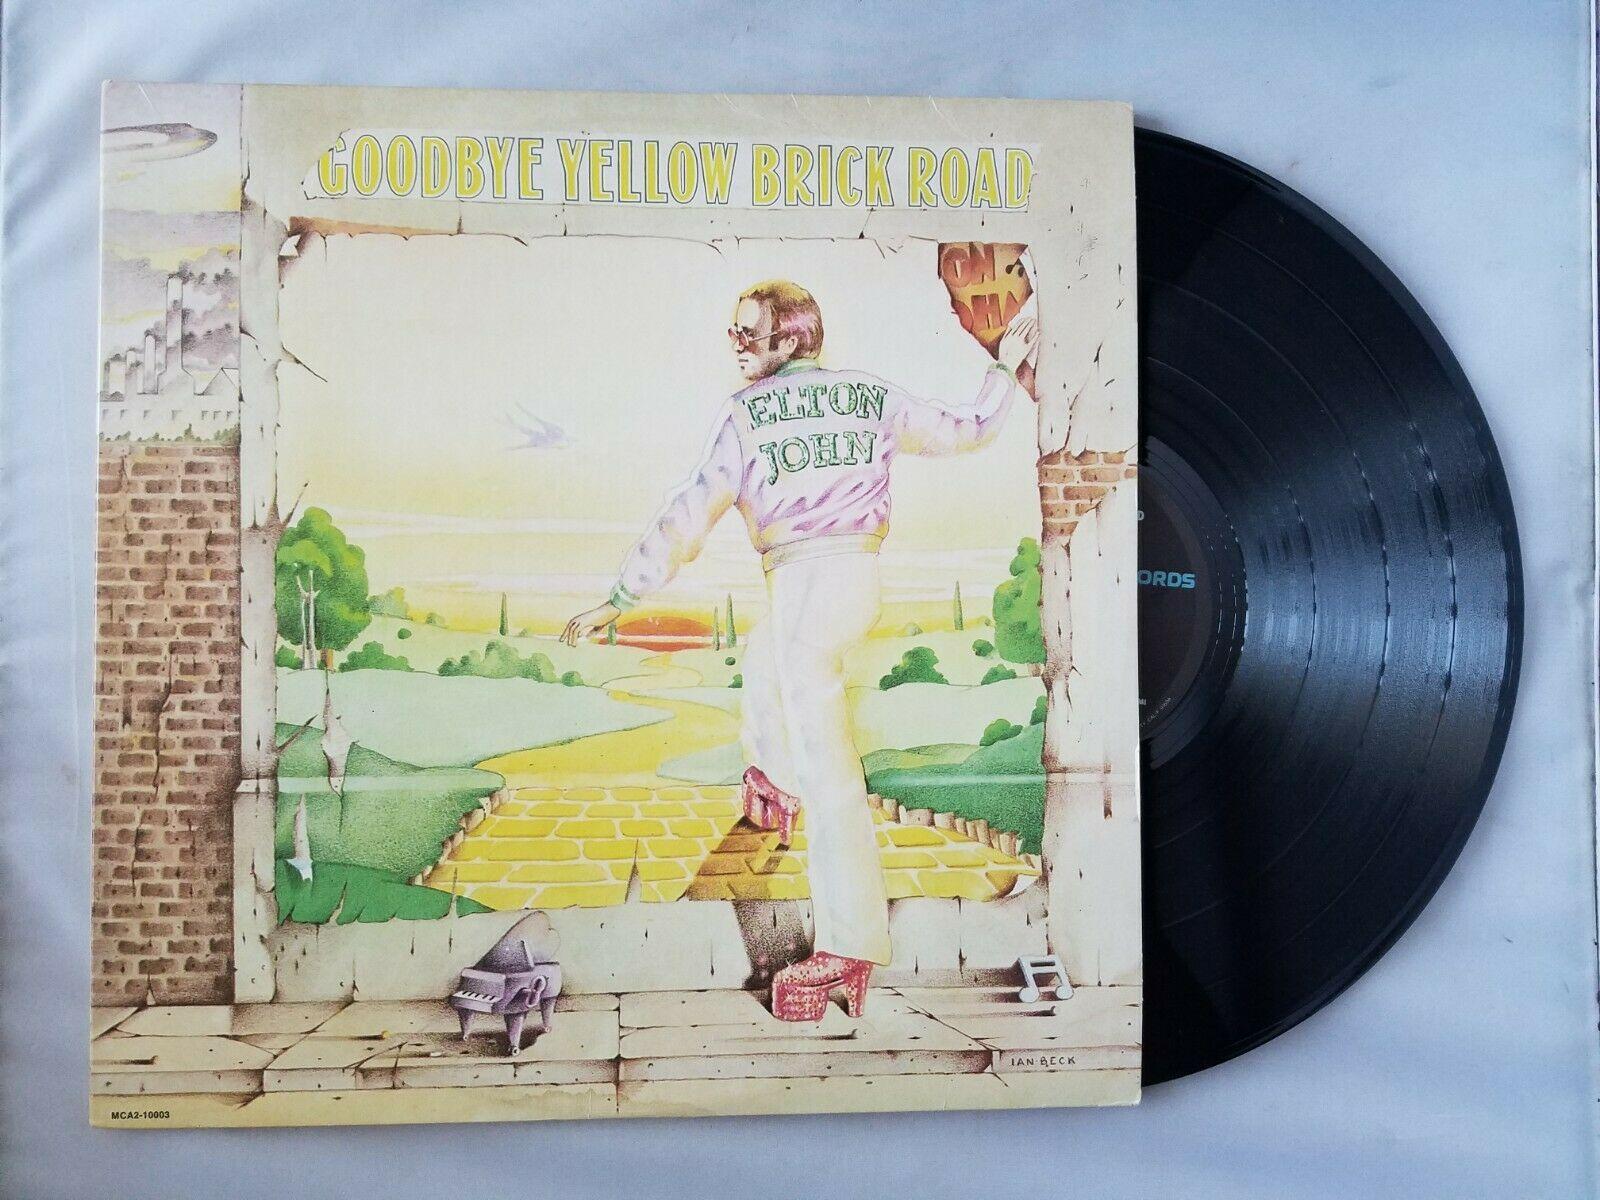 Elton John Yellow Brick Road Vinyl Record Vintage 1973 MCA Records